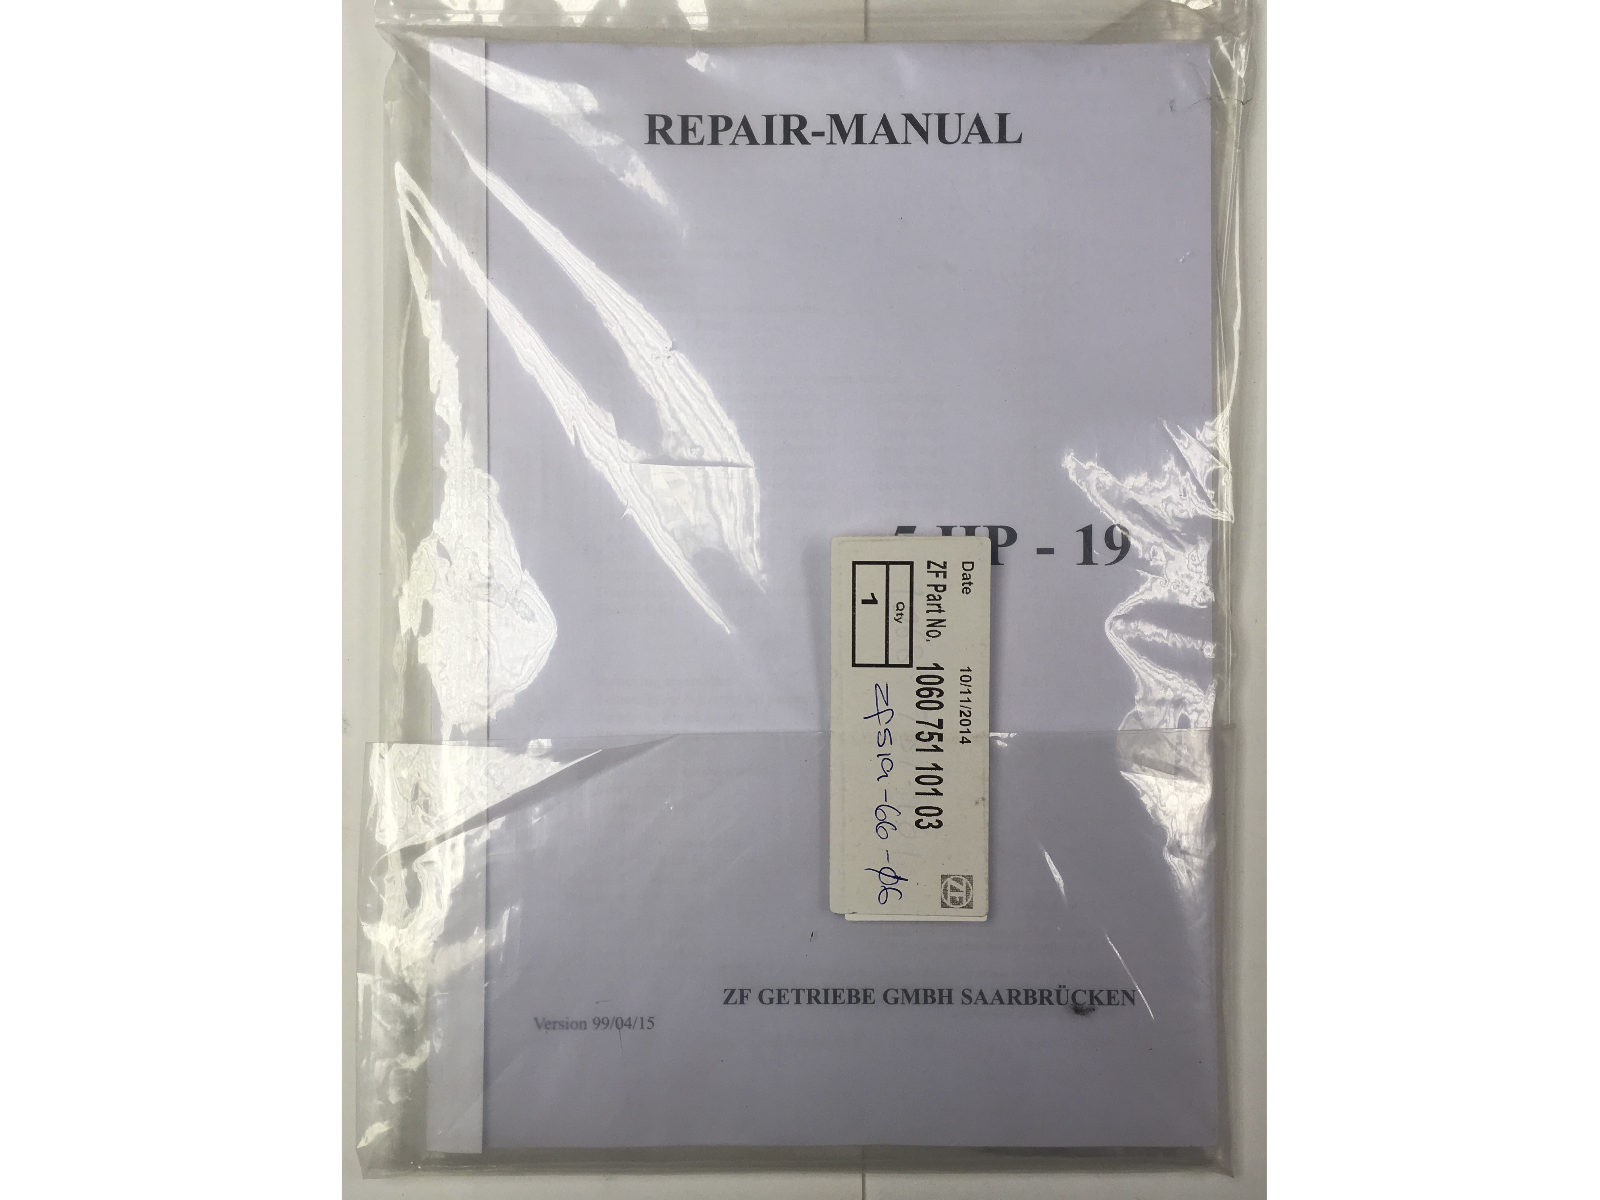 Manual taller ZF , service manuals ZF , repair manuals ZF